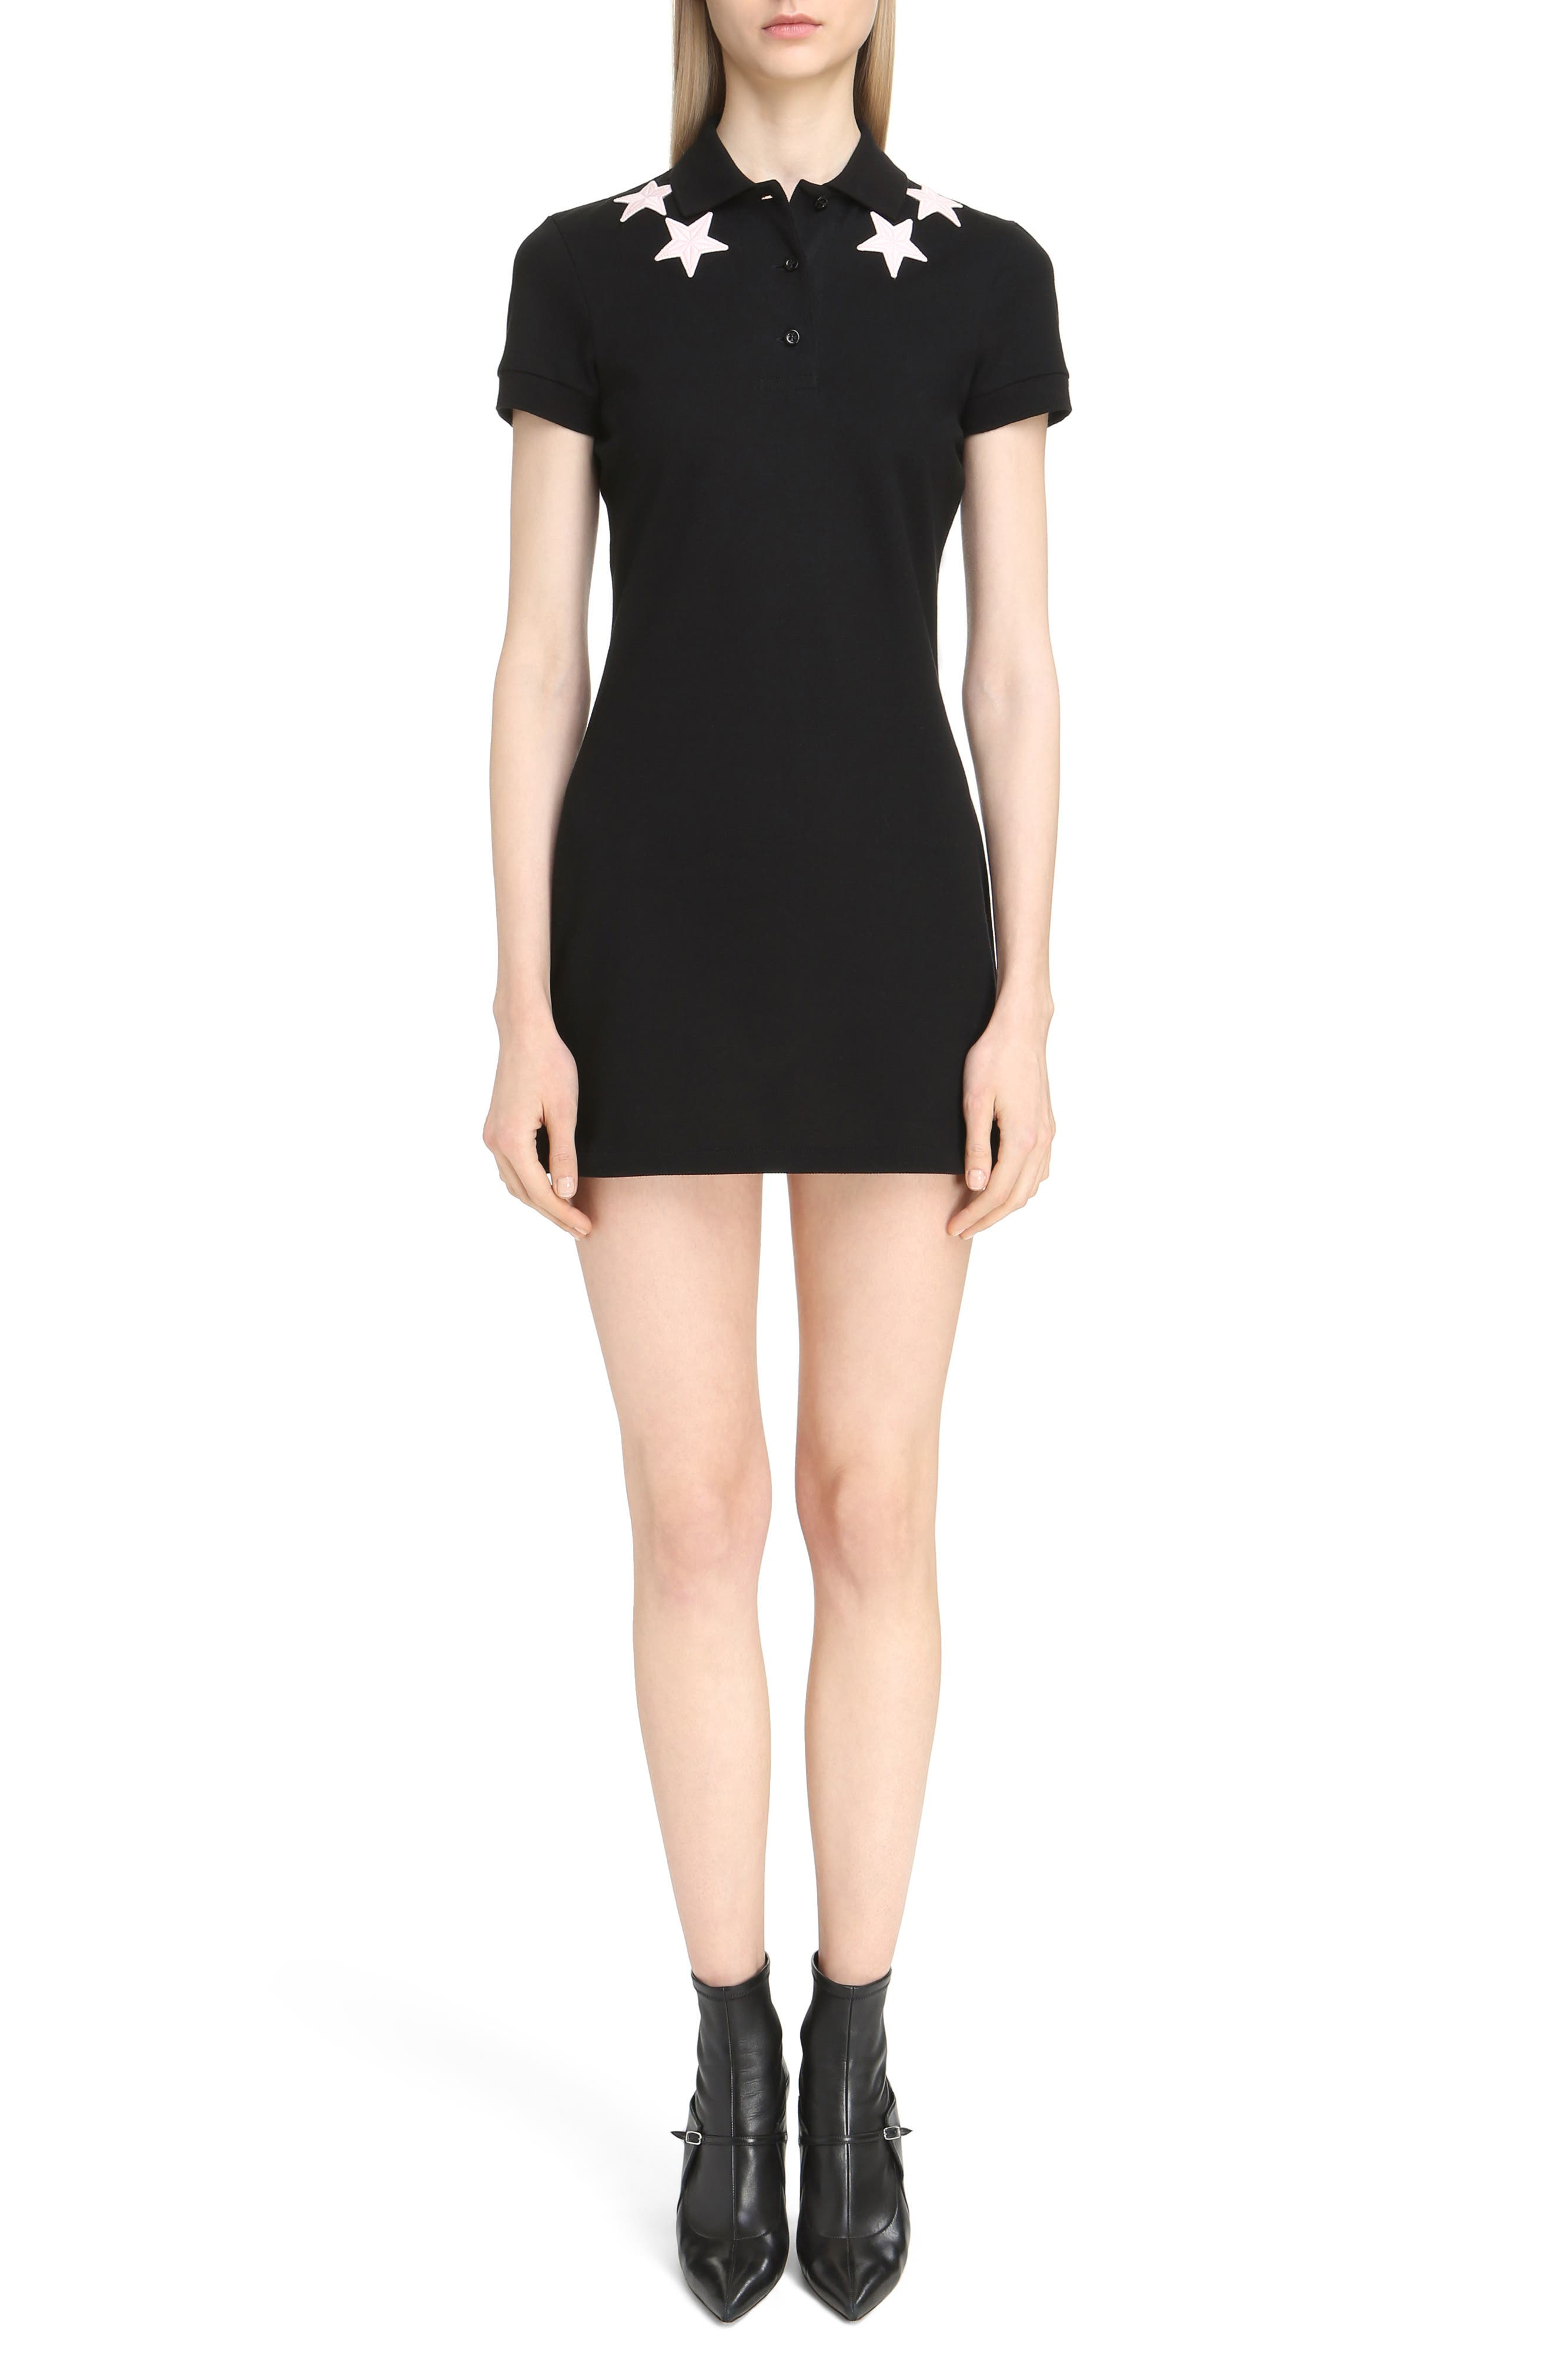 Main Image - Givenchy Star Embellished Polo Dress